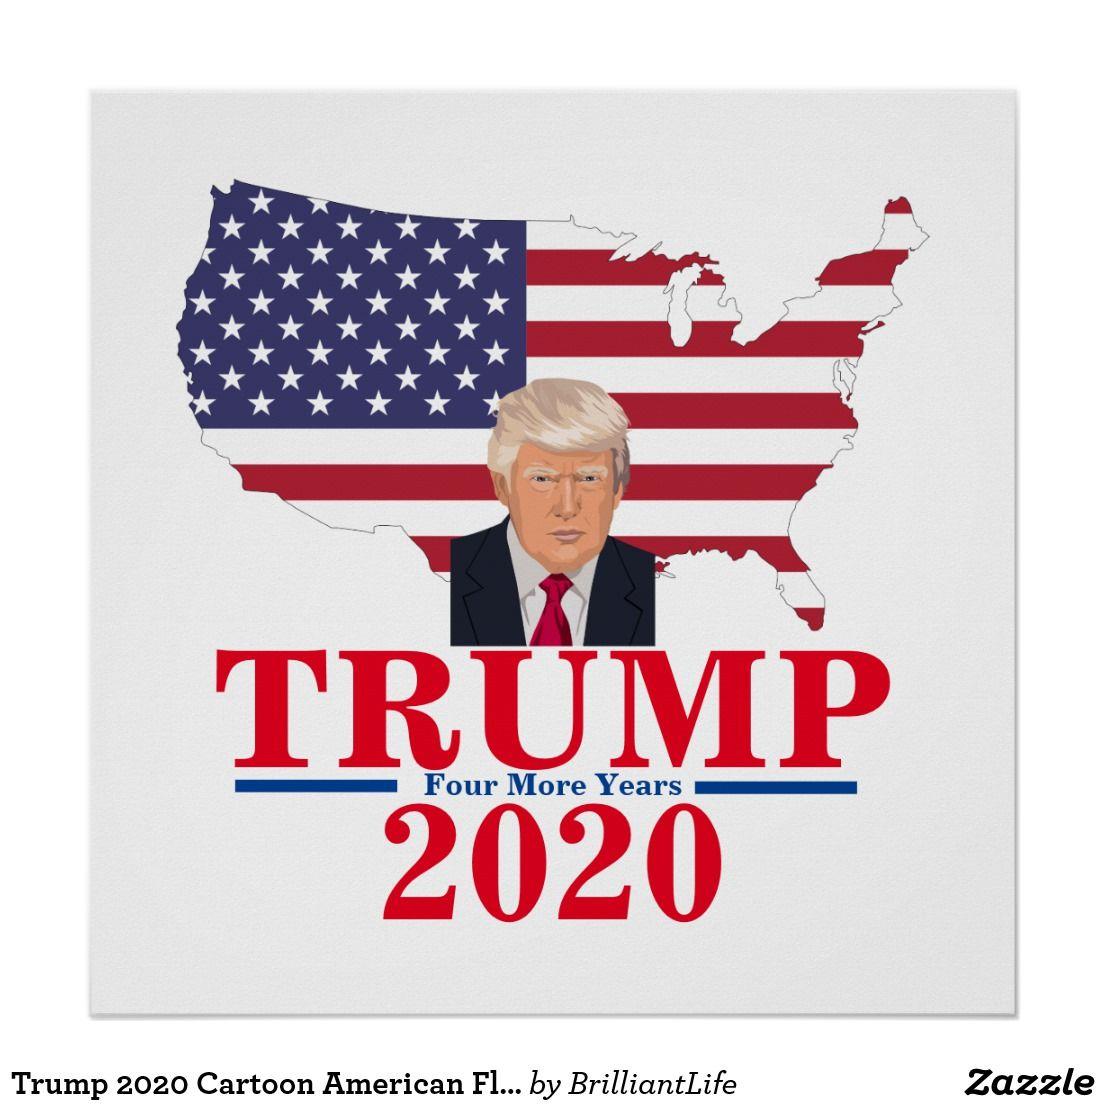 Trump 2020 Cartoon American Flag U S Map Poster Zazzle Com In 2020 Map Poster American Flag Background Cartoon Styles